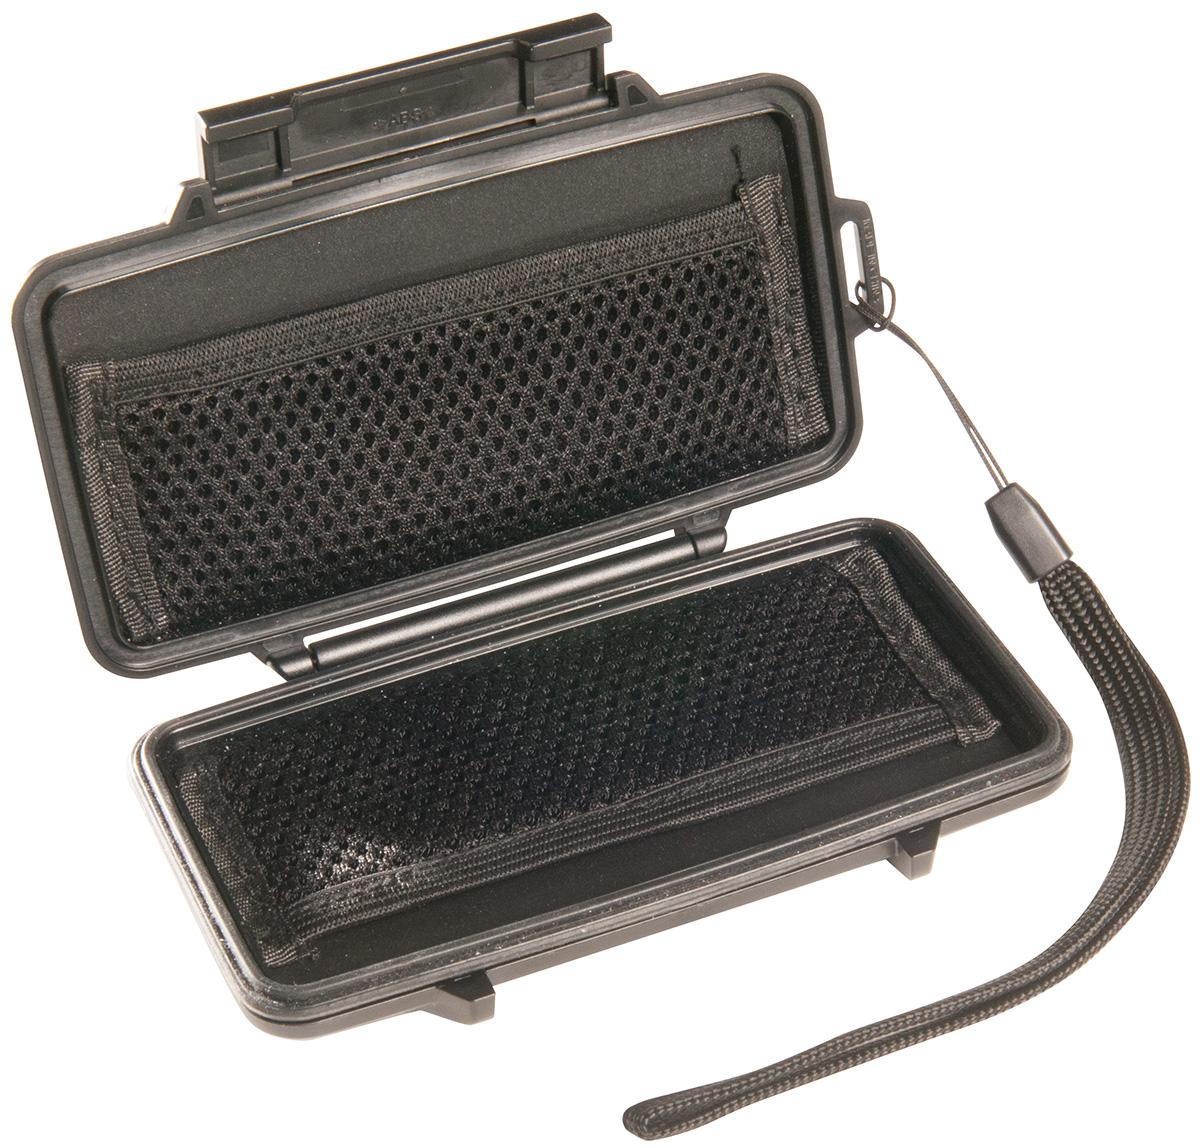 pelican peli products 0955 watertight plastic hard wallet case